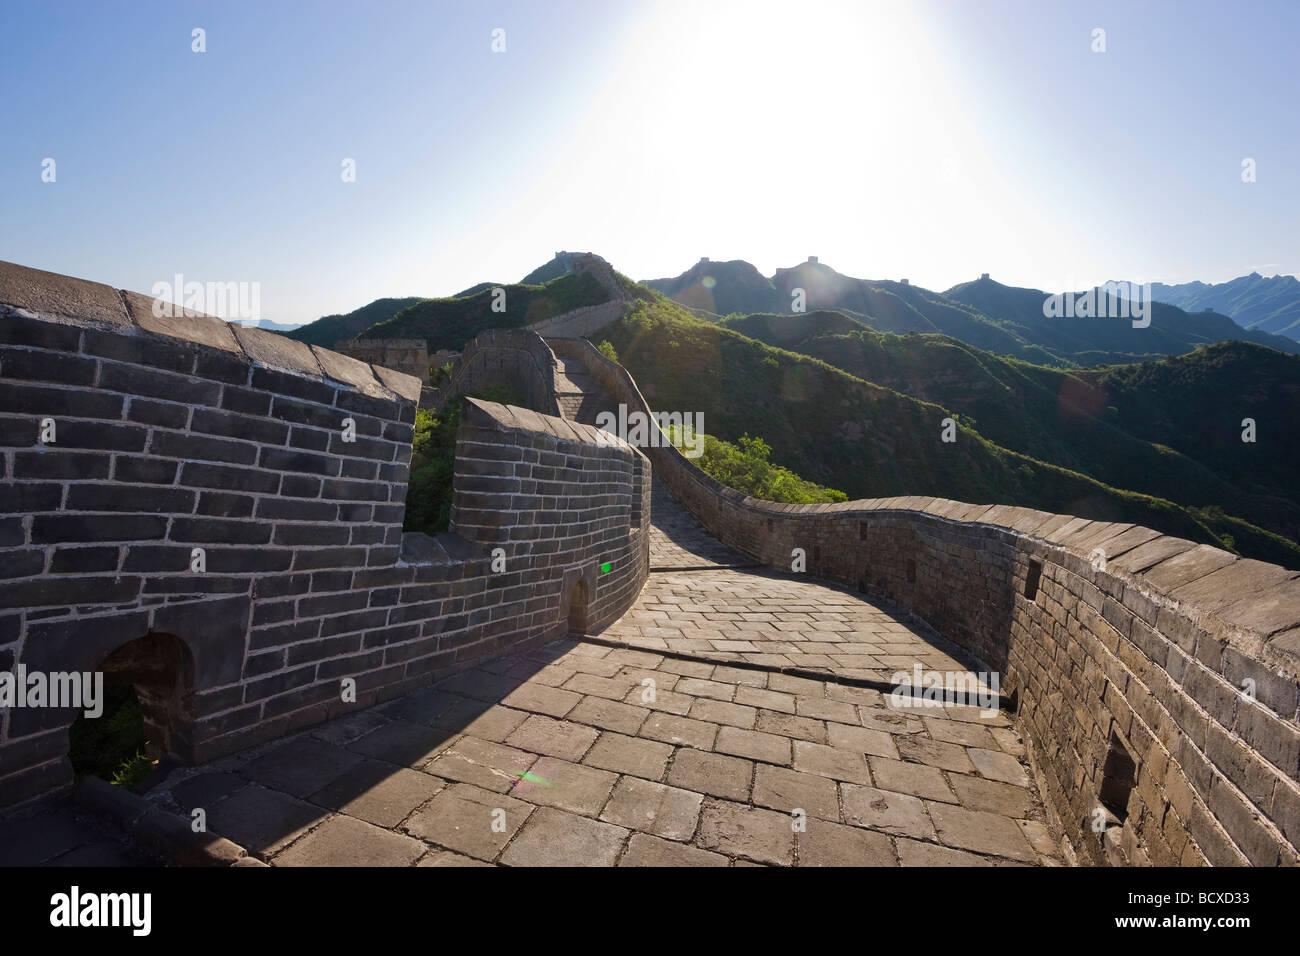 Great Wall of China - Stock Image